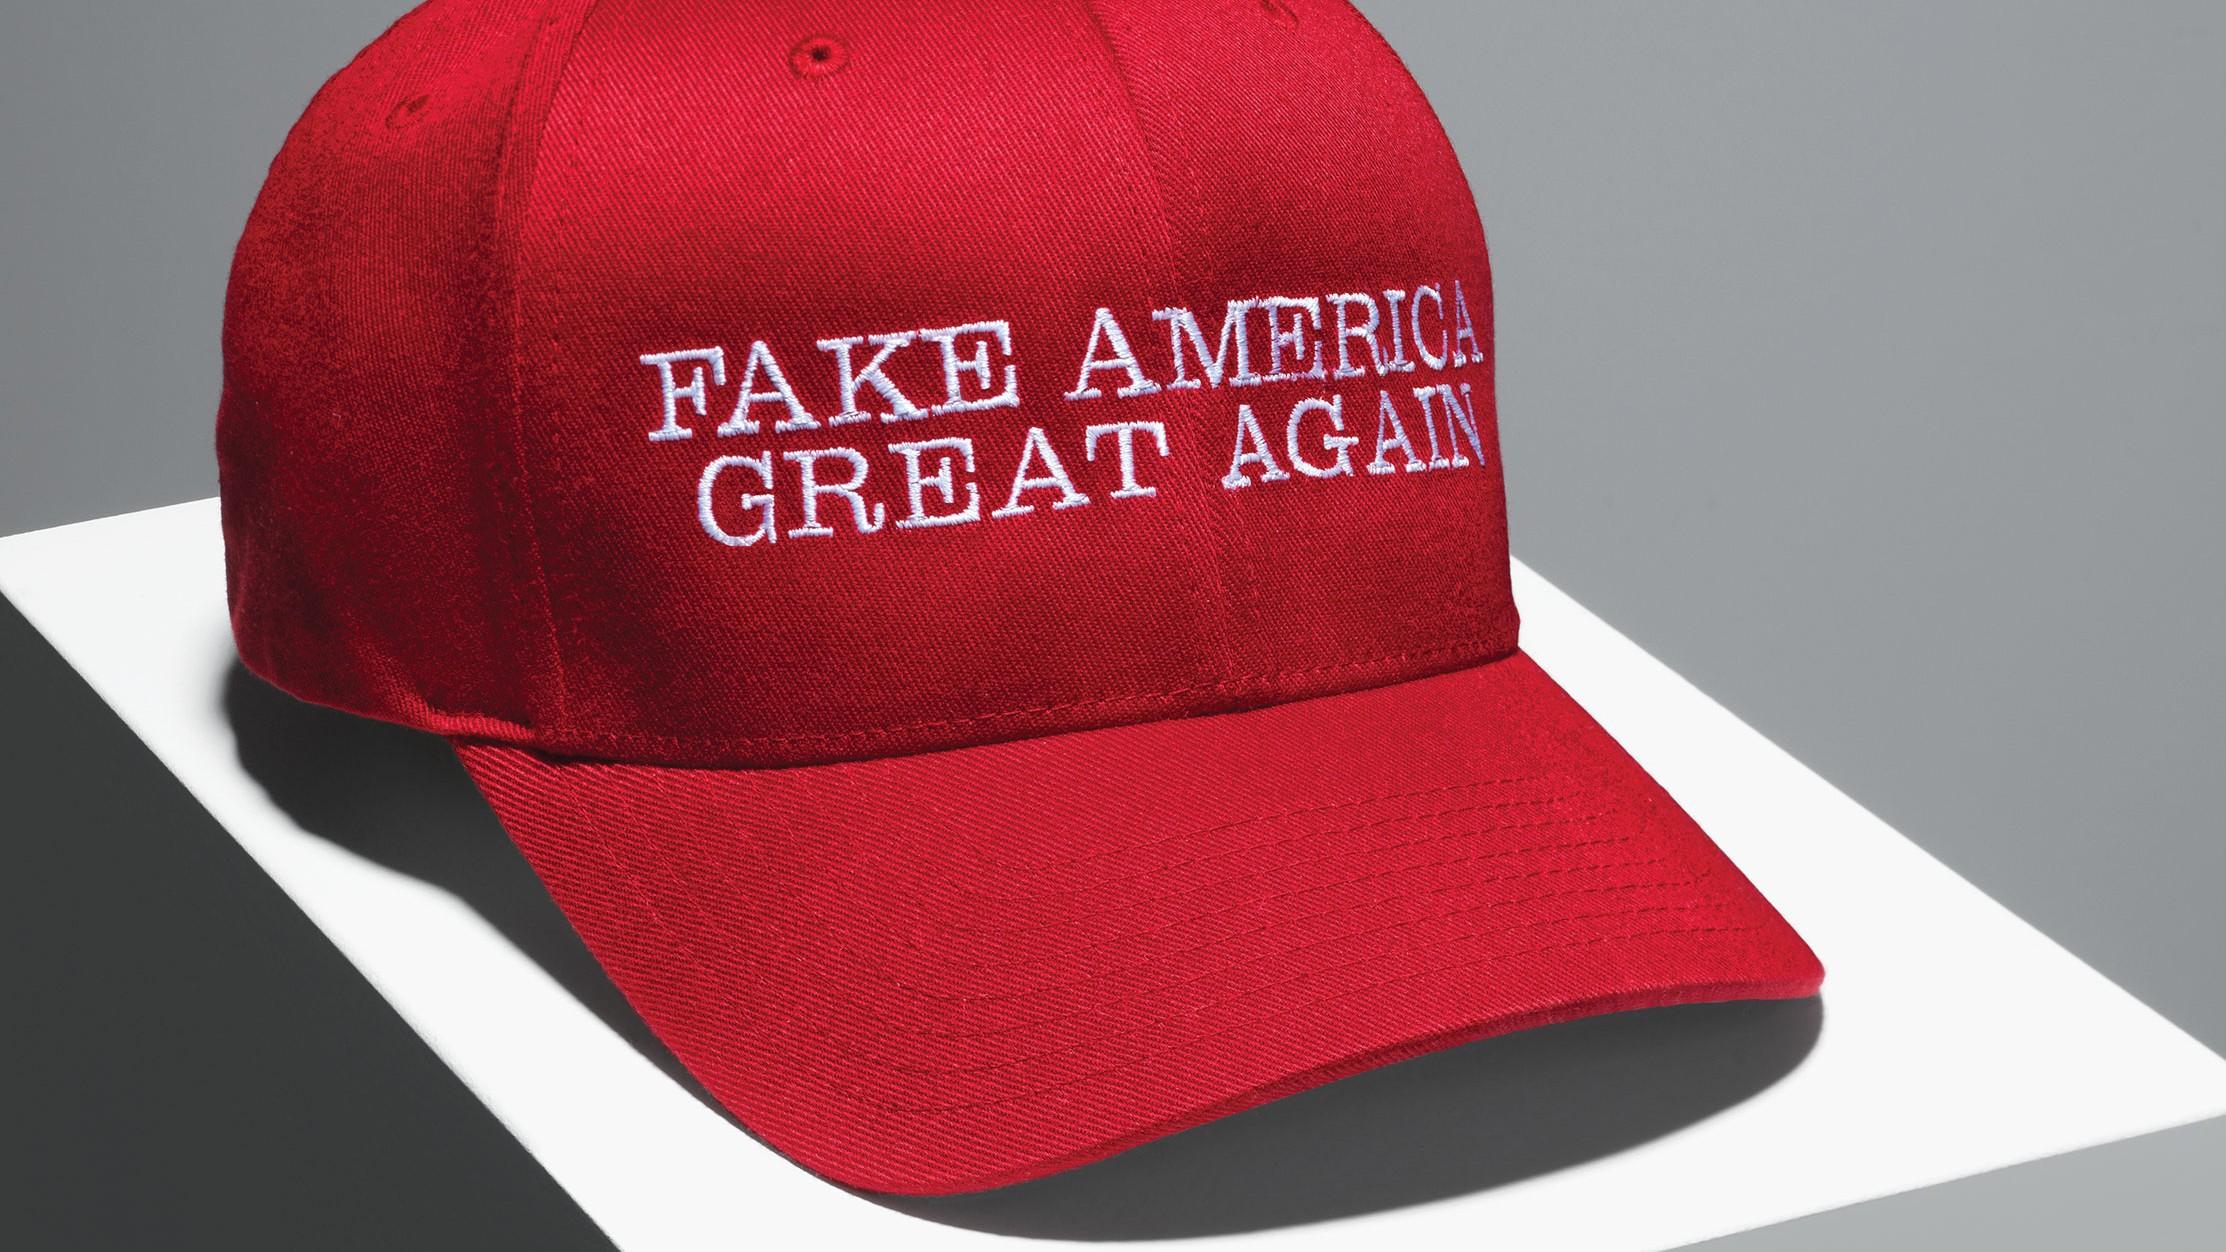 Fake America great again